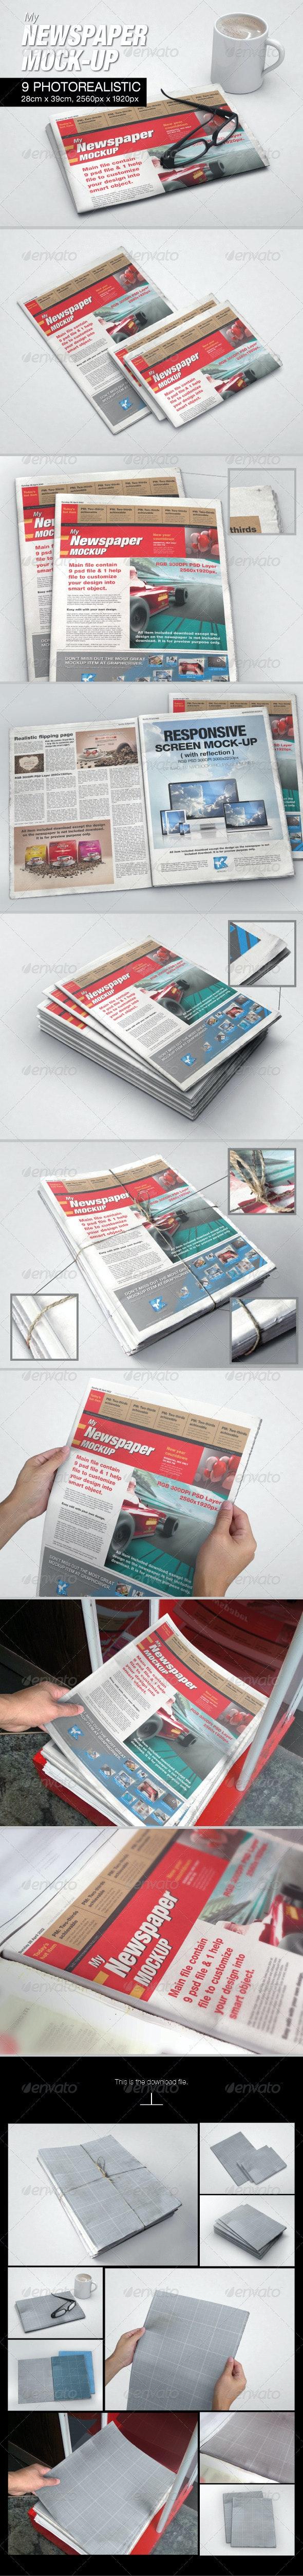 MyNewspaper Mock-up - Print Product Mock-Ups